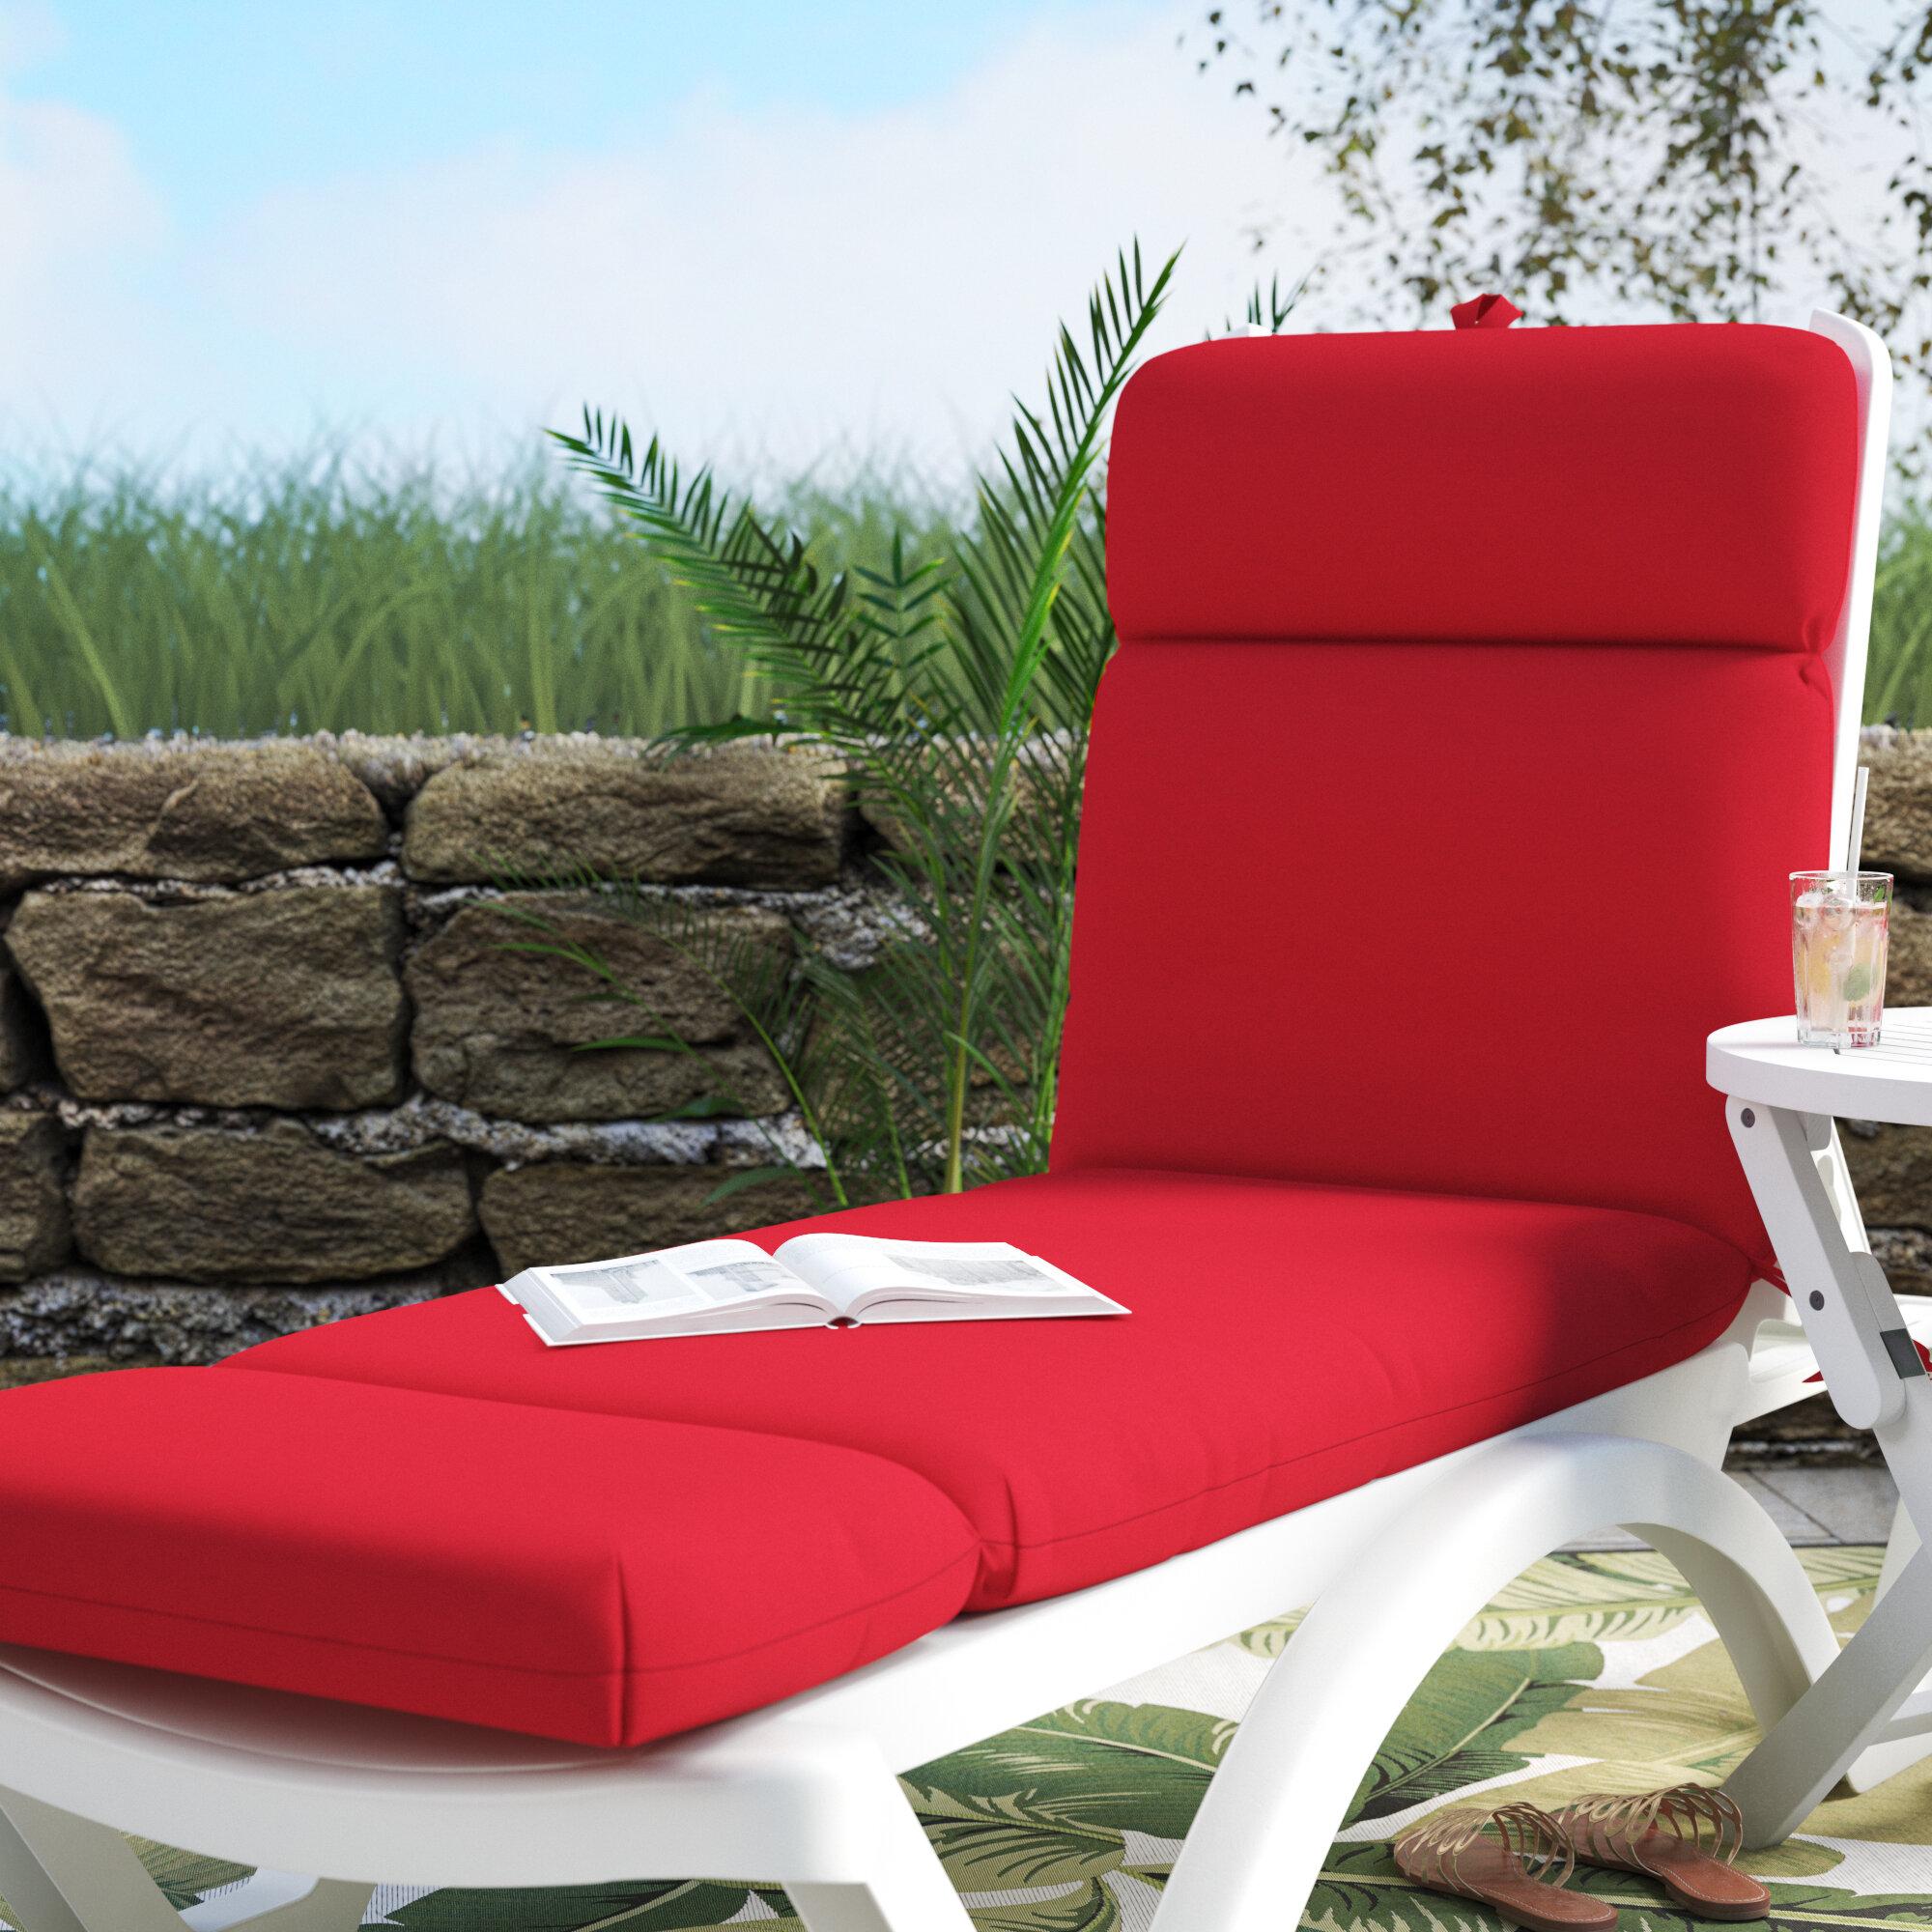 - Beachcrest Home Indoor/Outdoor Sunbrella Chaise Lounge Cushion